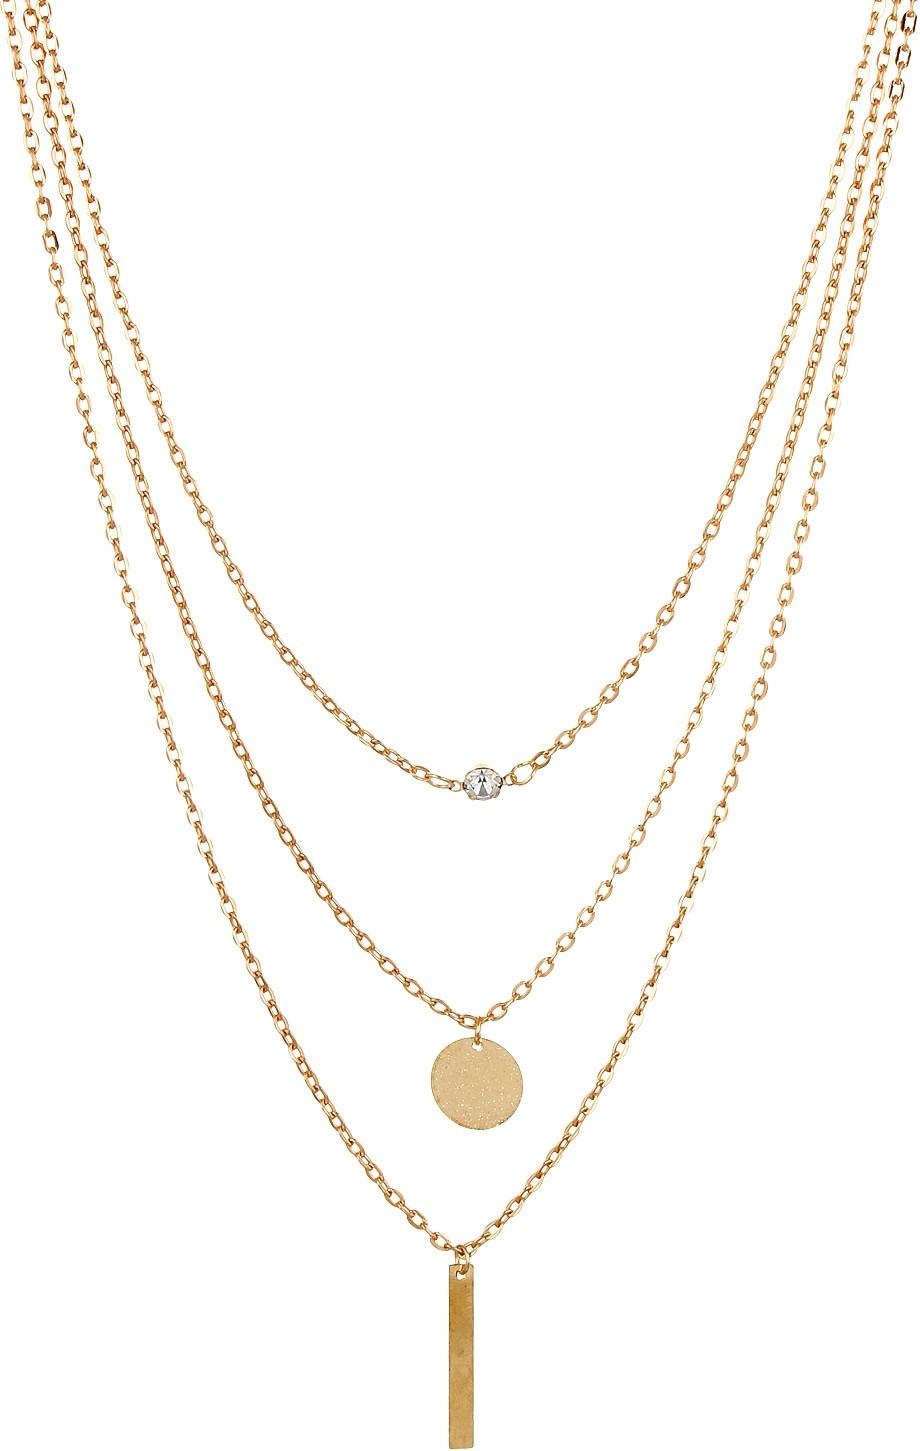 Deals - Delhi - Layered Jewellery <br> Bracelets, Pendants & more<br> Category - jewellery<br> Business - Flipkart.com